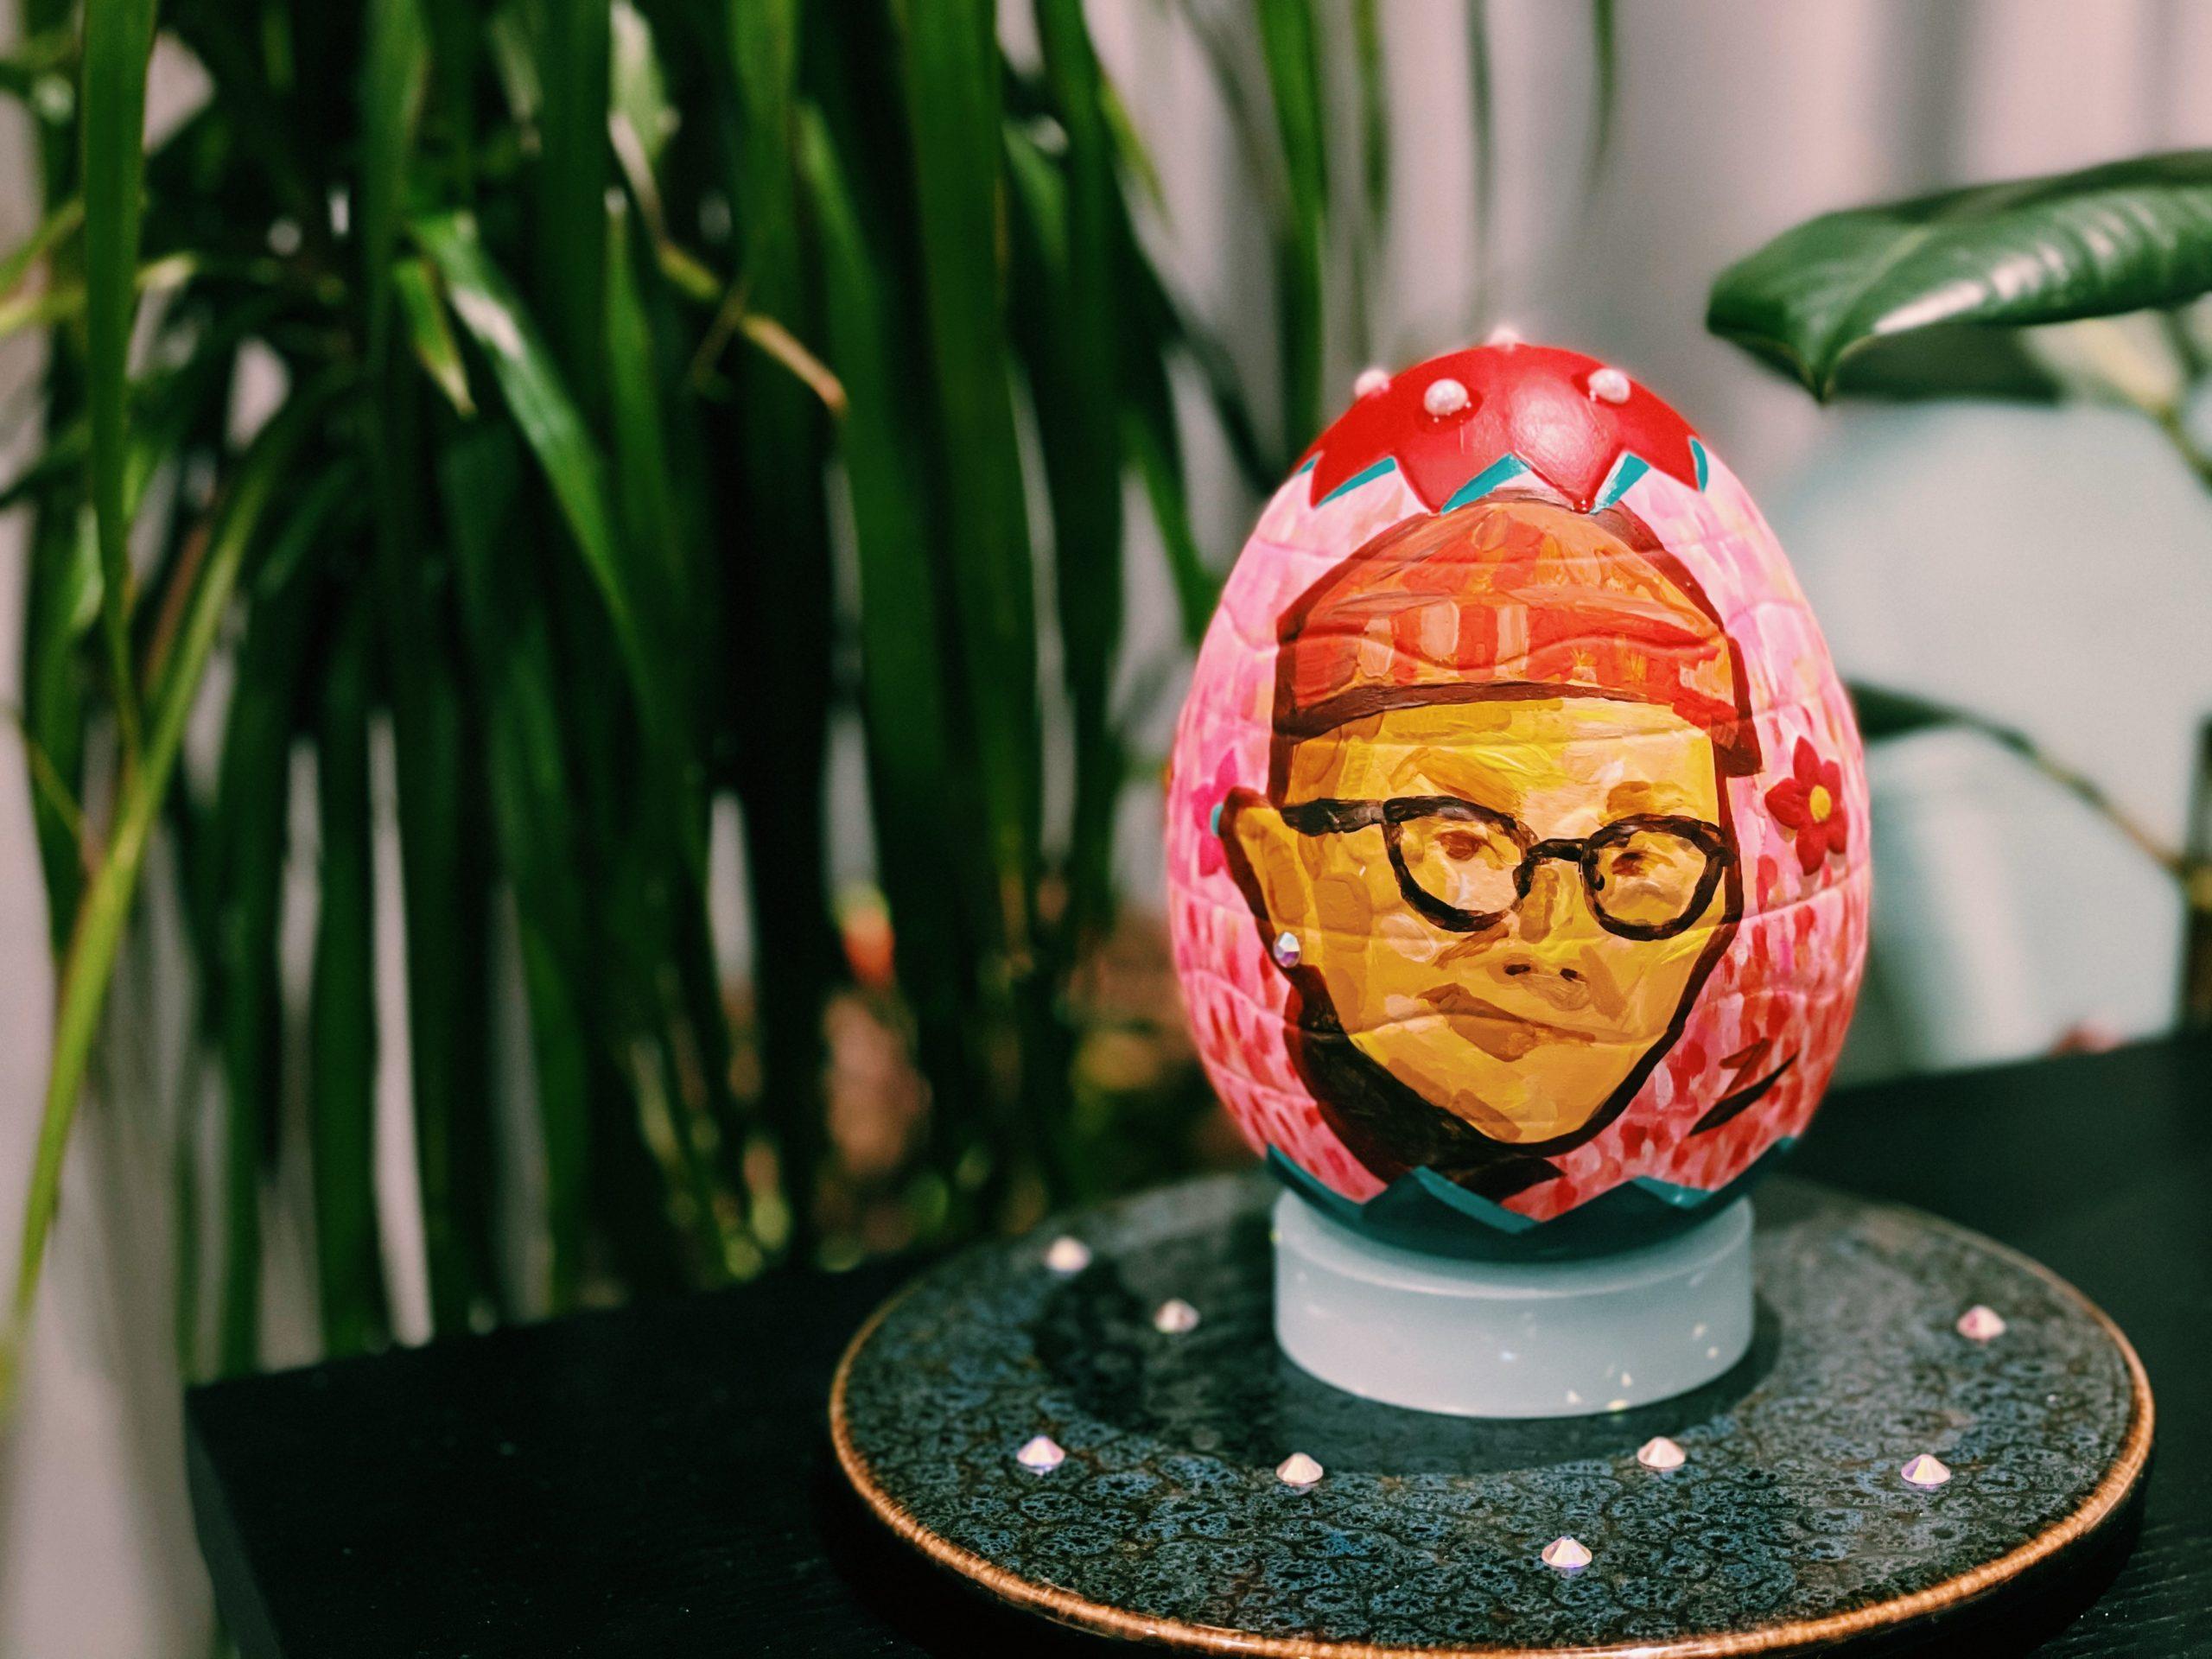 https://lisaslaw.co.uk/wp-content/uploads/2021/04/Zody-Egg-1-1-scaled.jpg